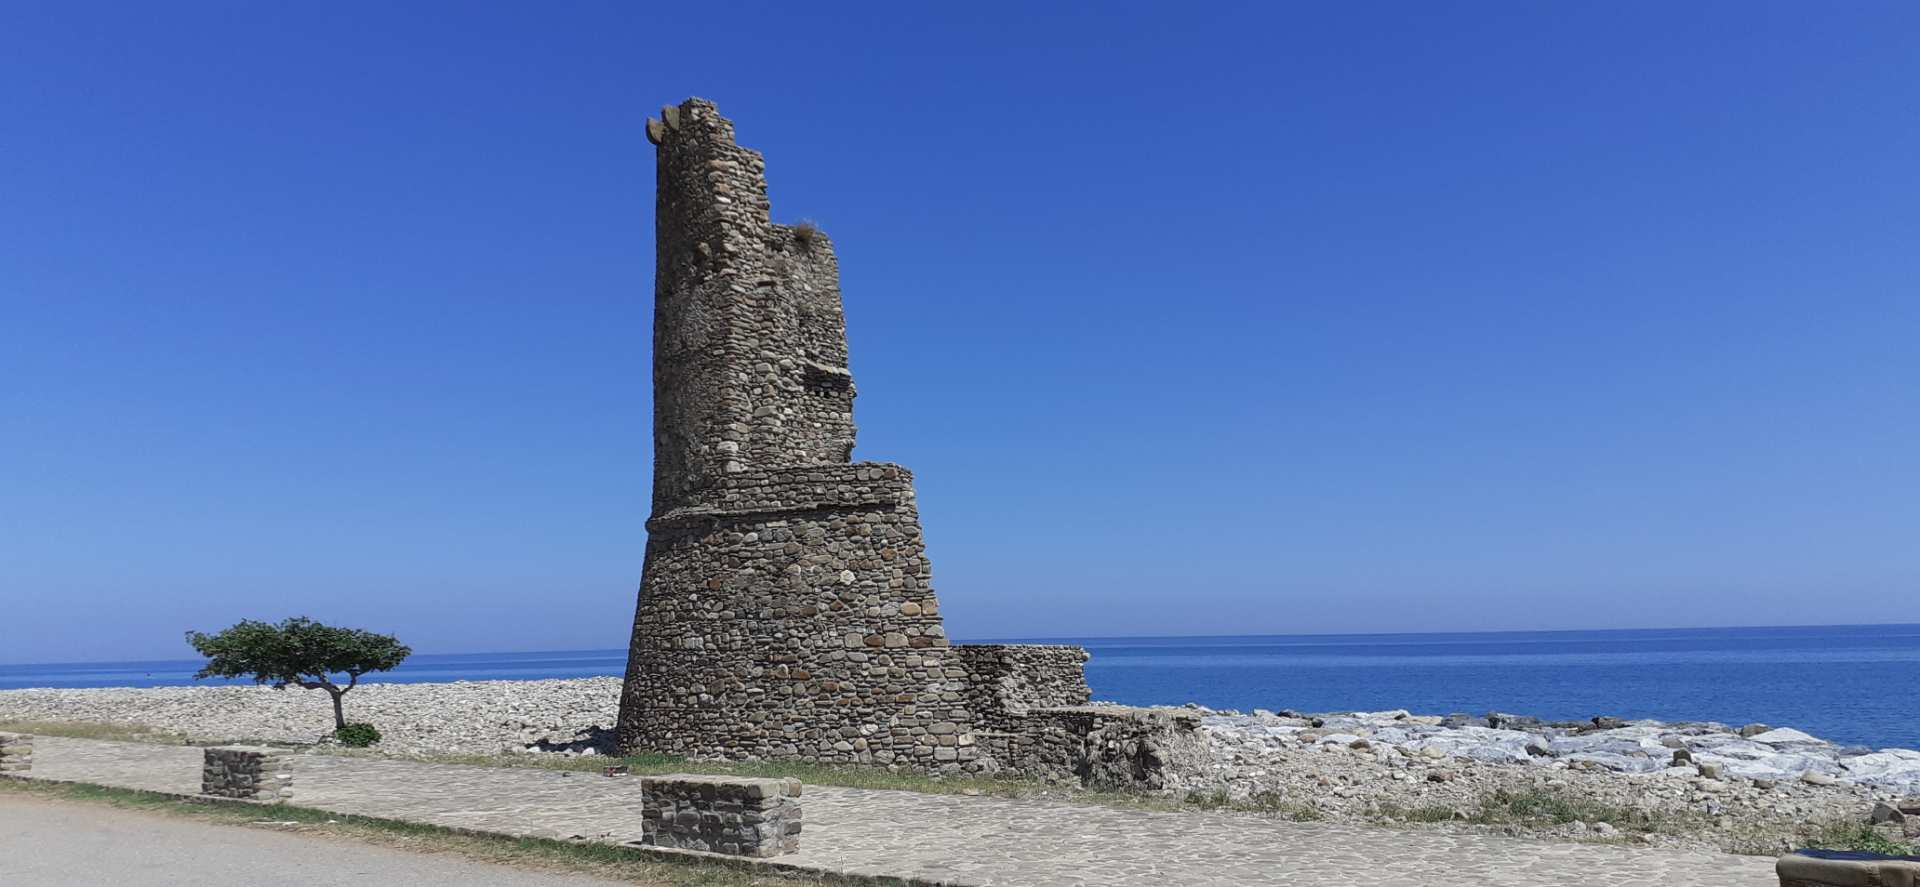 Torre Spulico